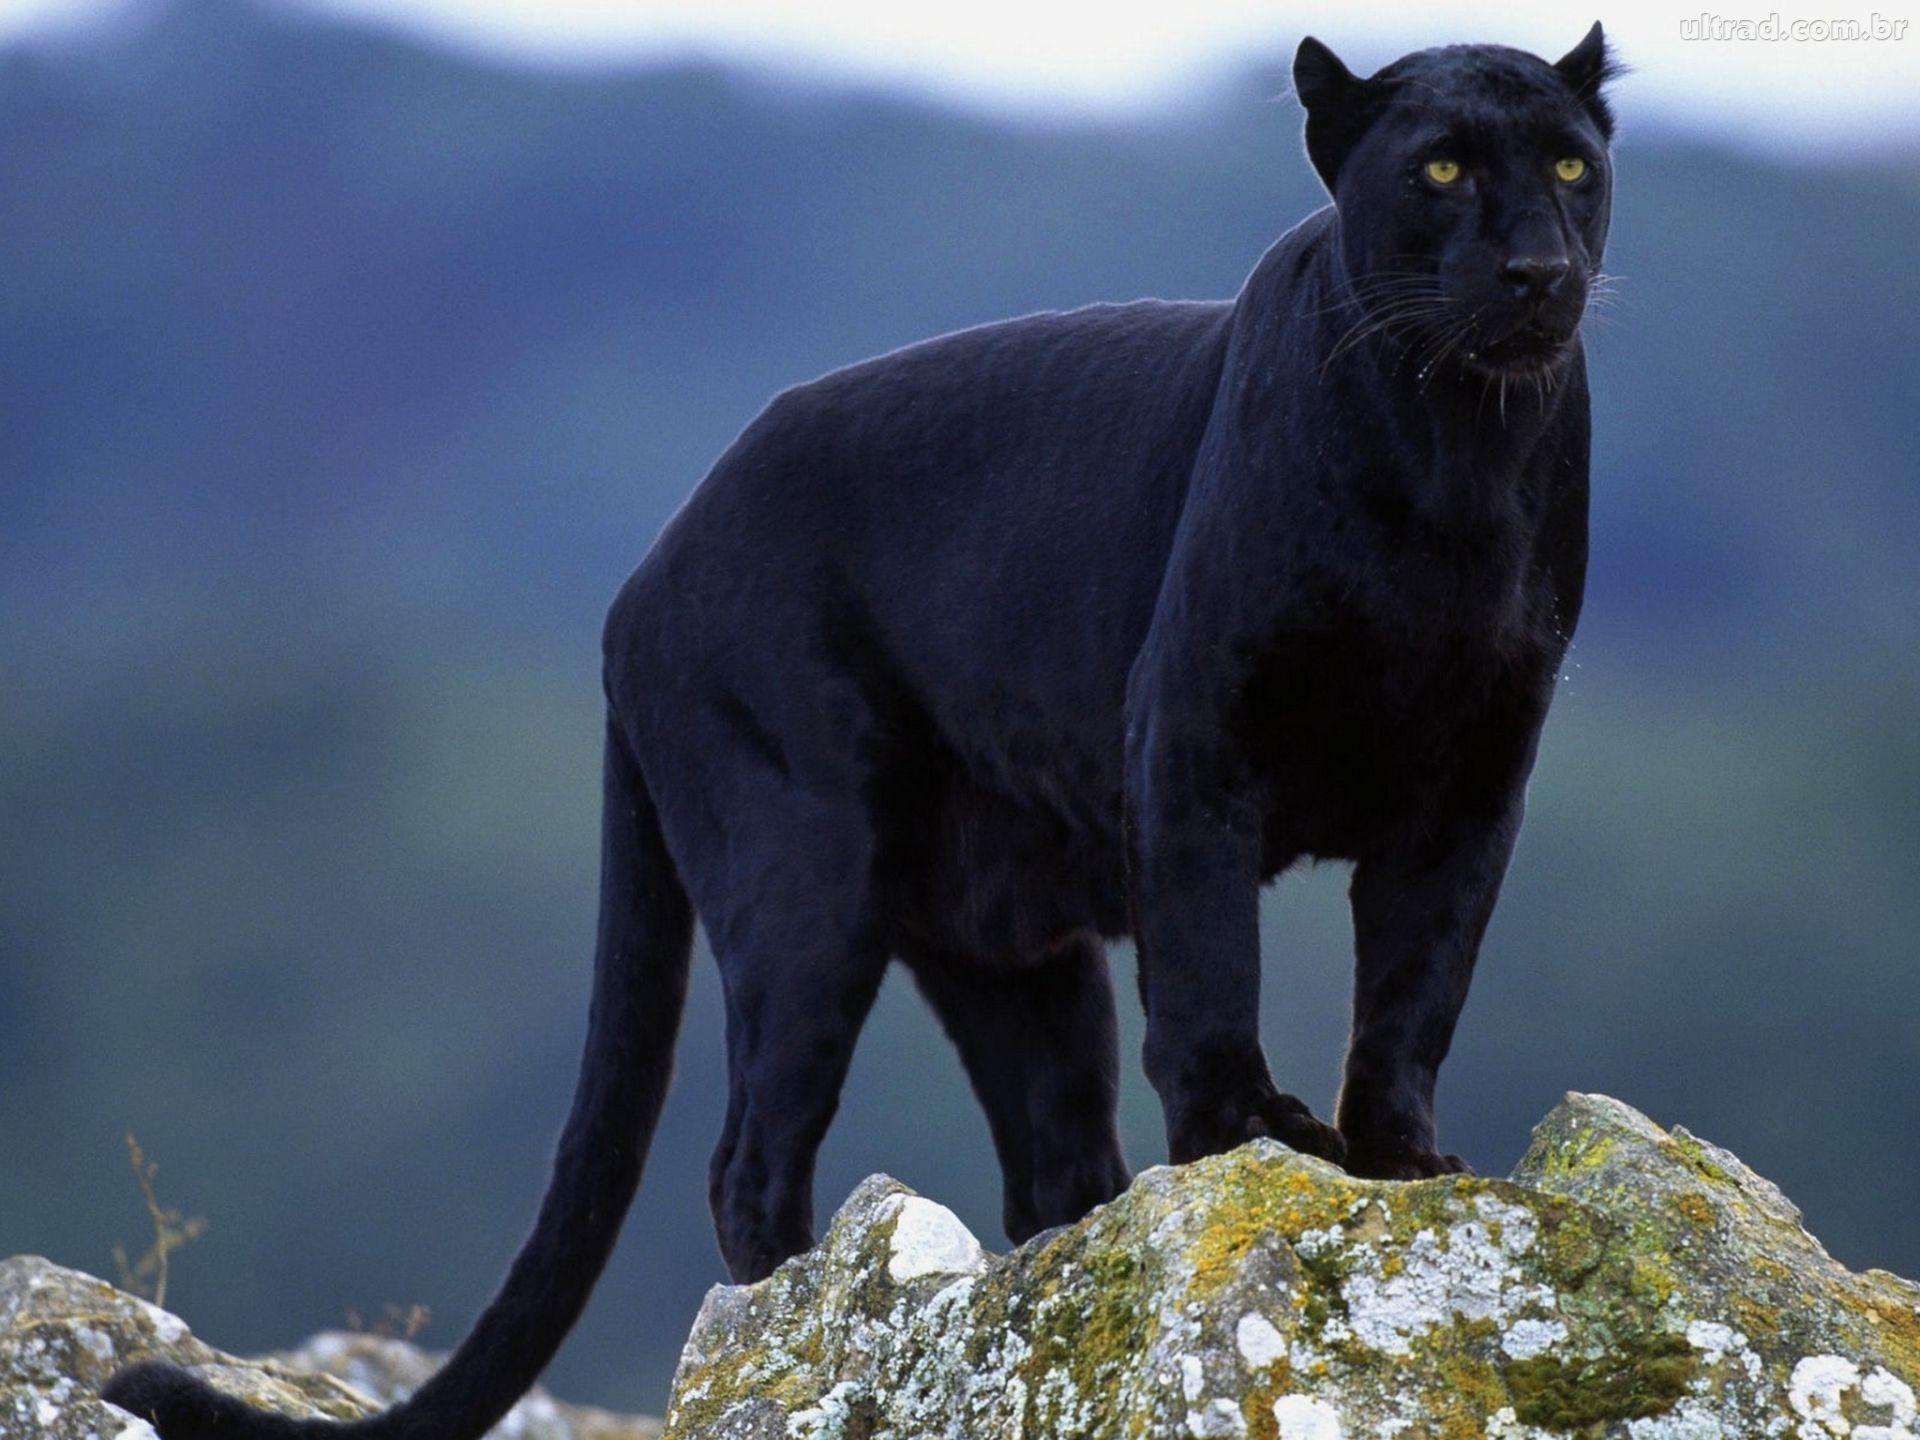 Animales - Naturaleza - Página 3 674fa065b9544a19c7b85c8b2f375ed6